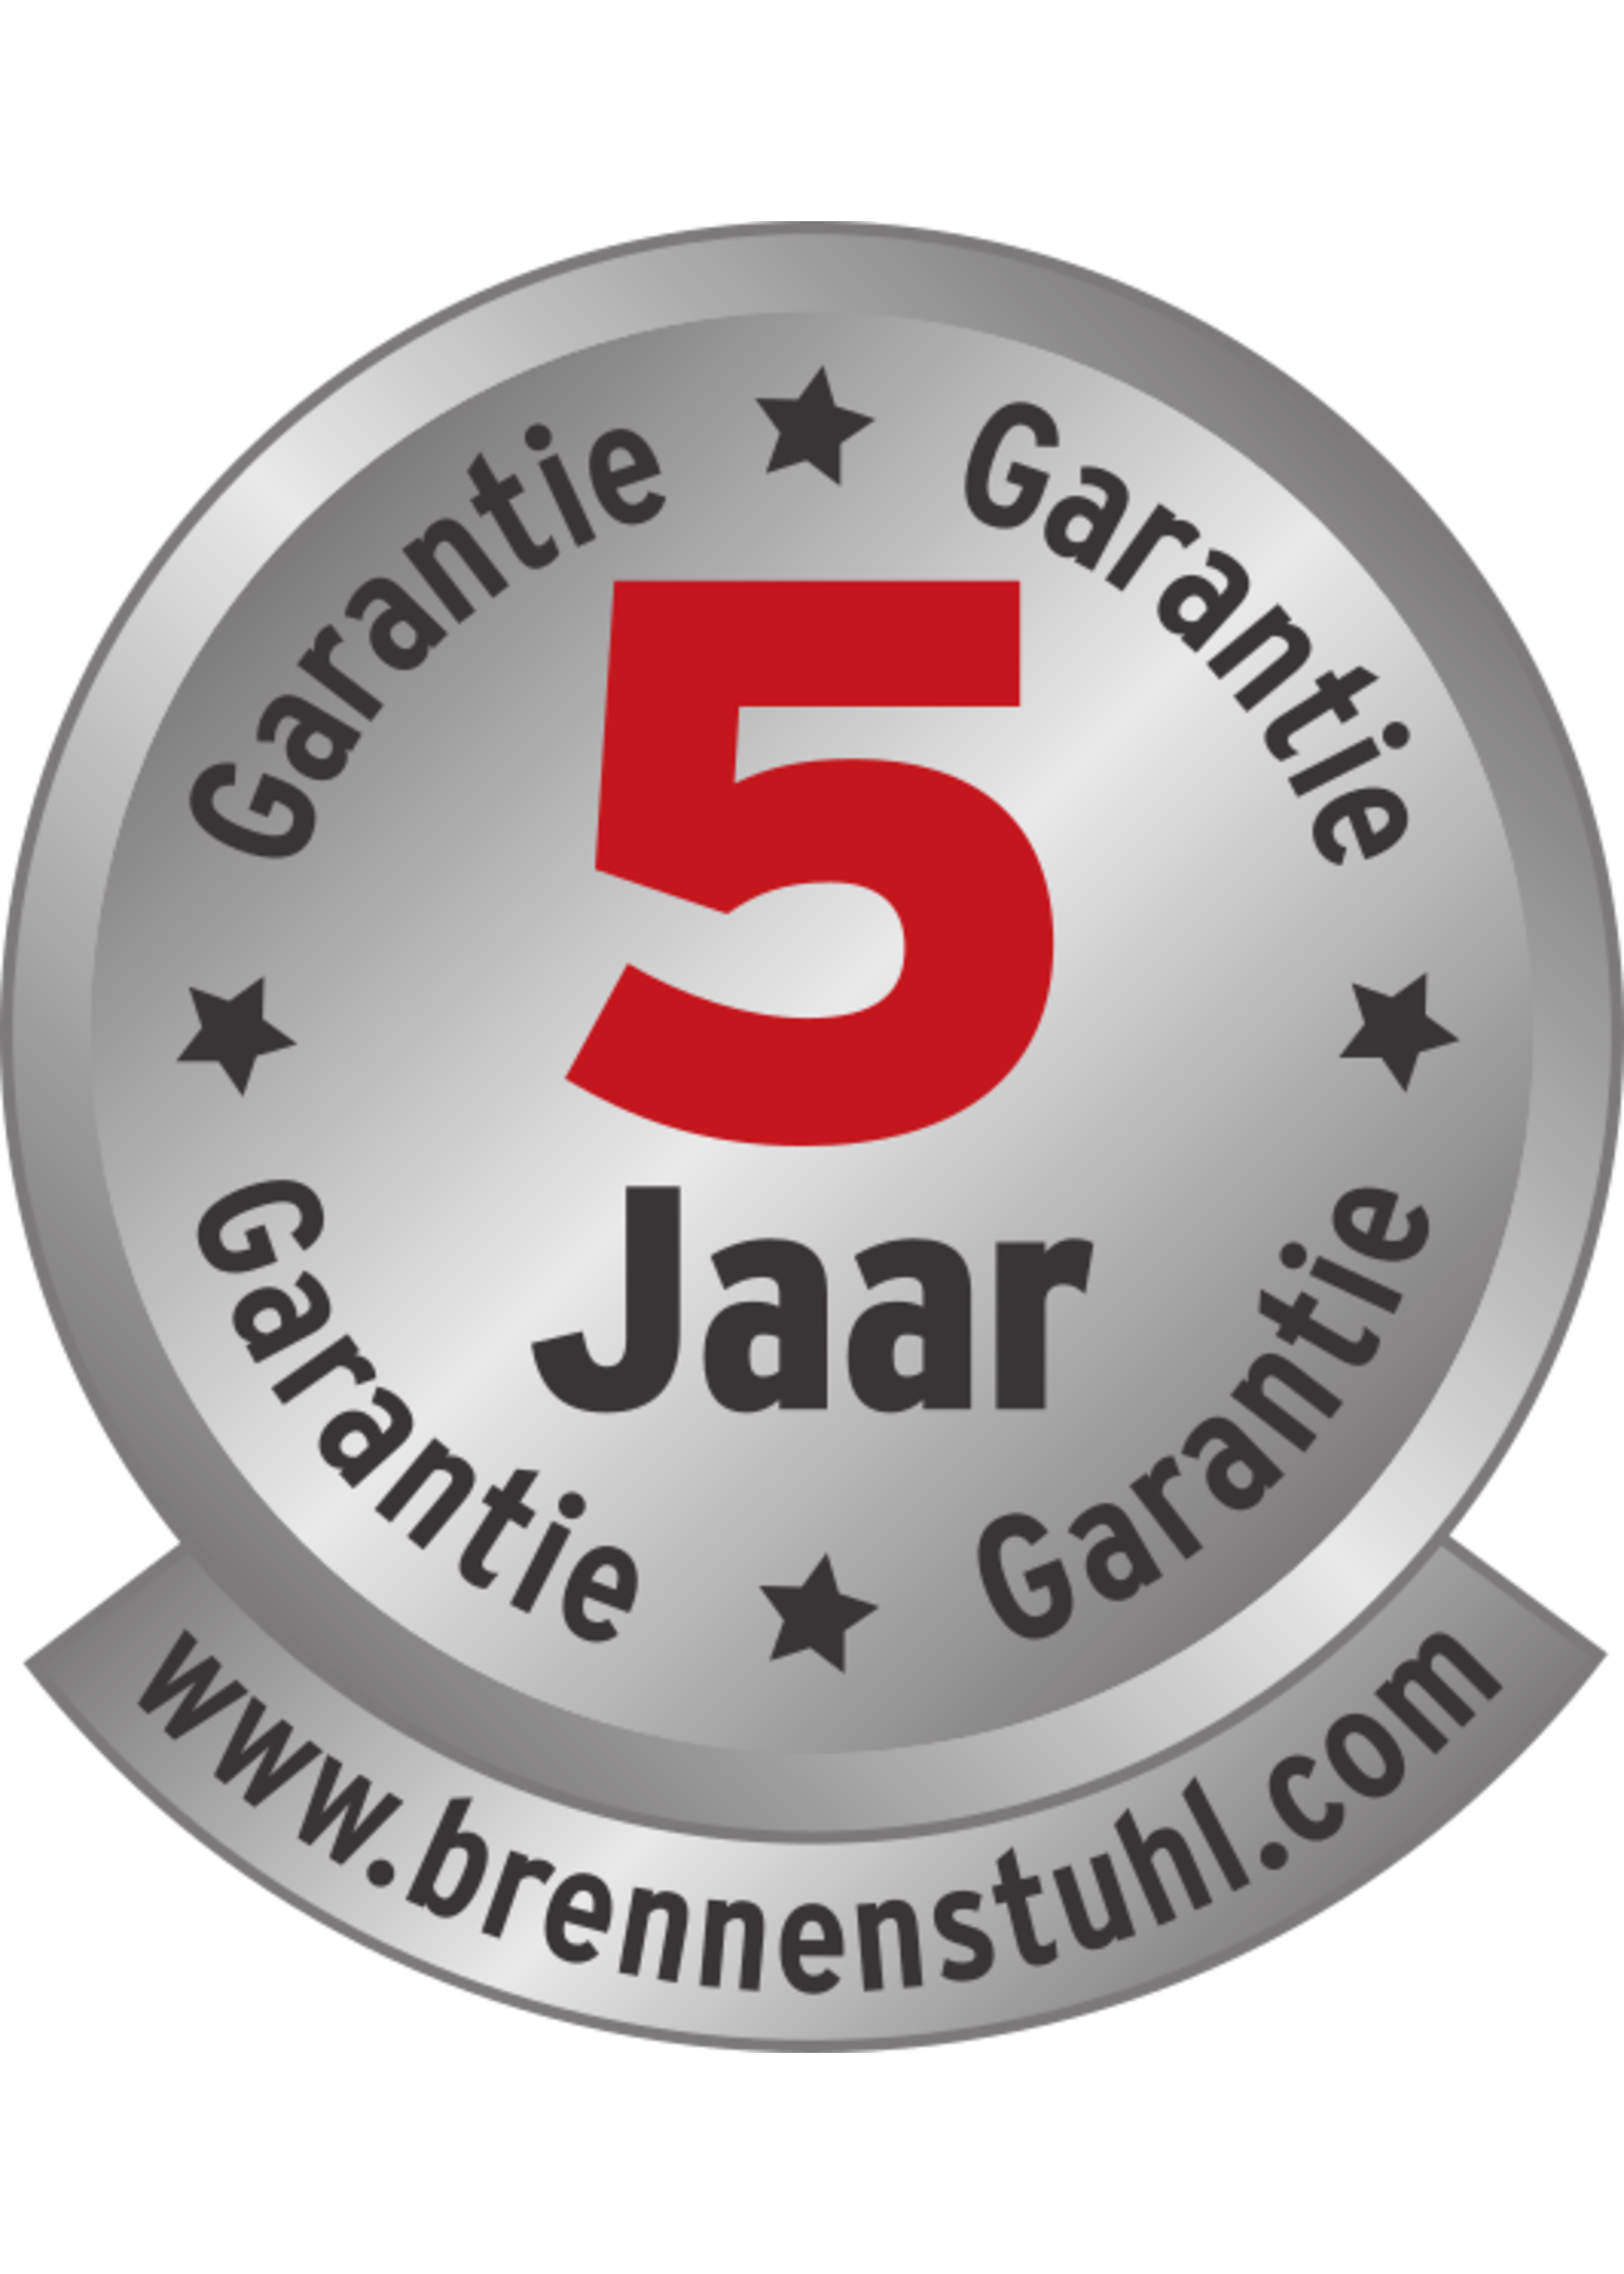 Brennenstuhl Brennenstuhl ProfessionalLINE 9161250100 Verlengkabel - IP44 - H07RN-F 3G1.5 - 25m - Zwart